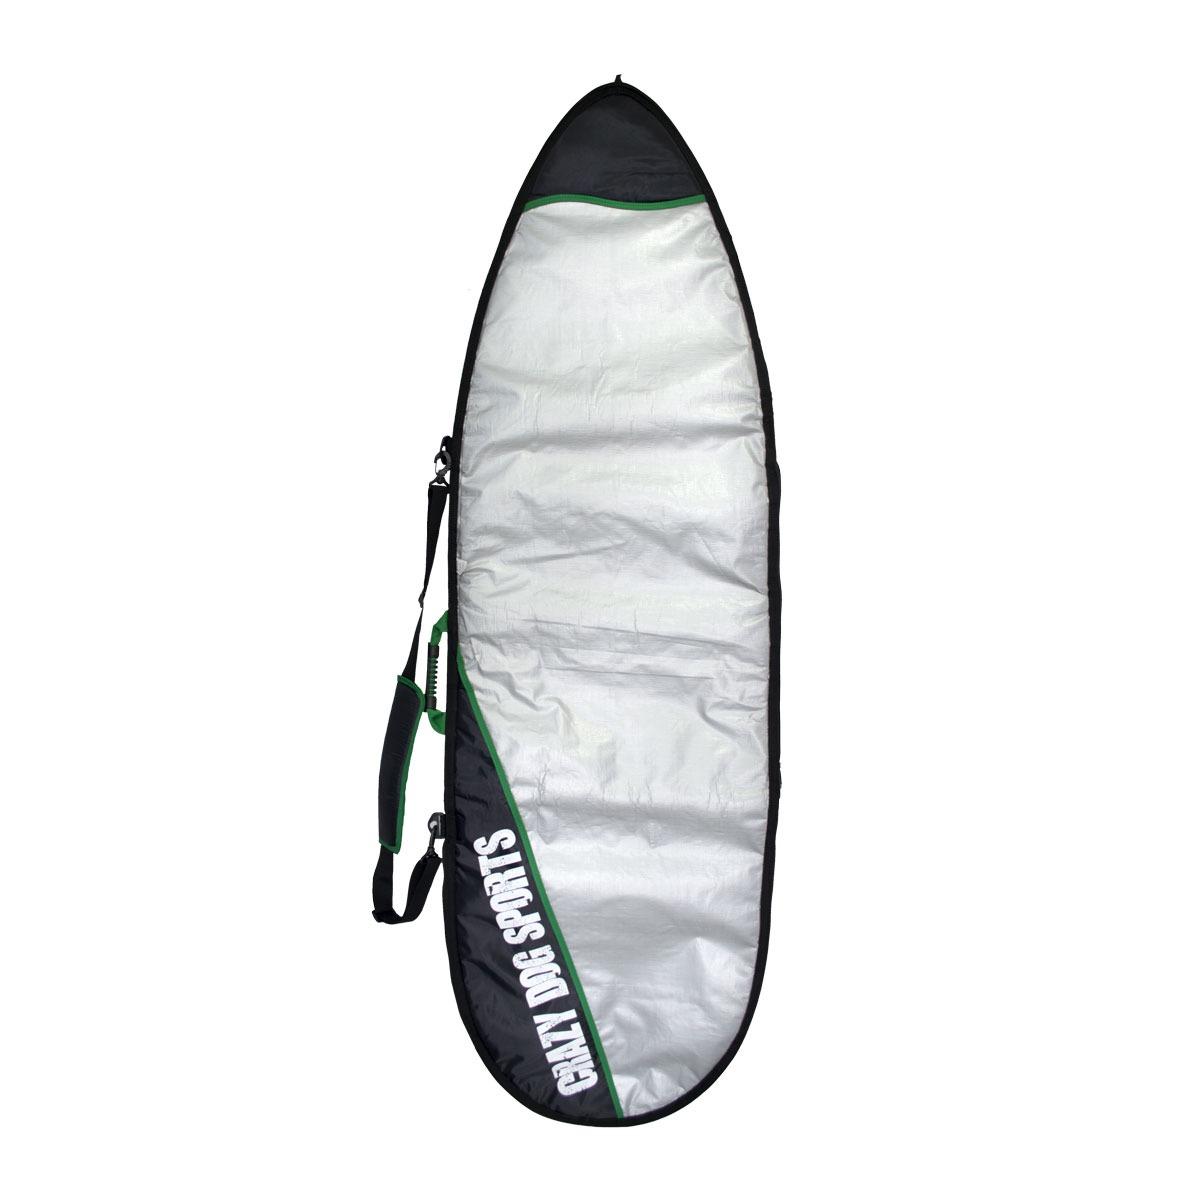 a742392d9 capa prancha de surf refletiva fish crazy dog. Carregando zoom.